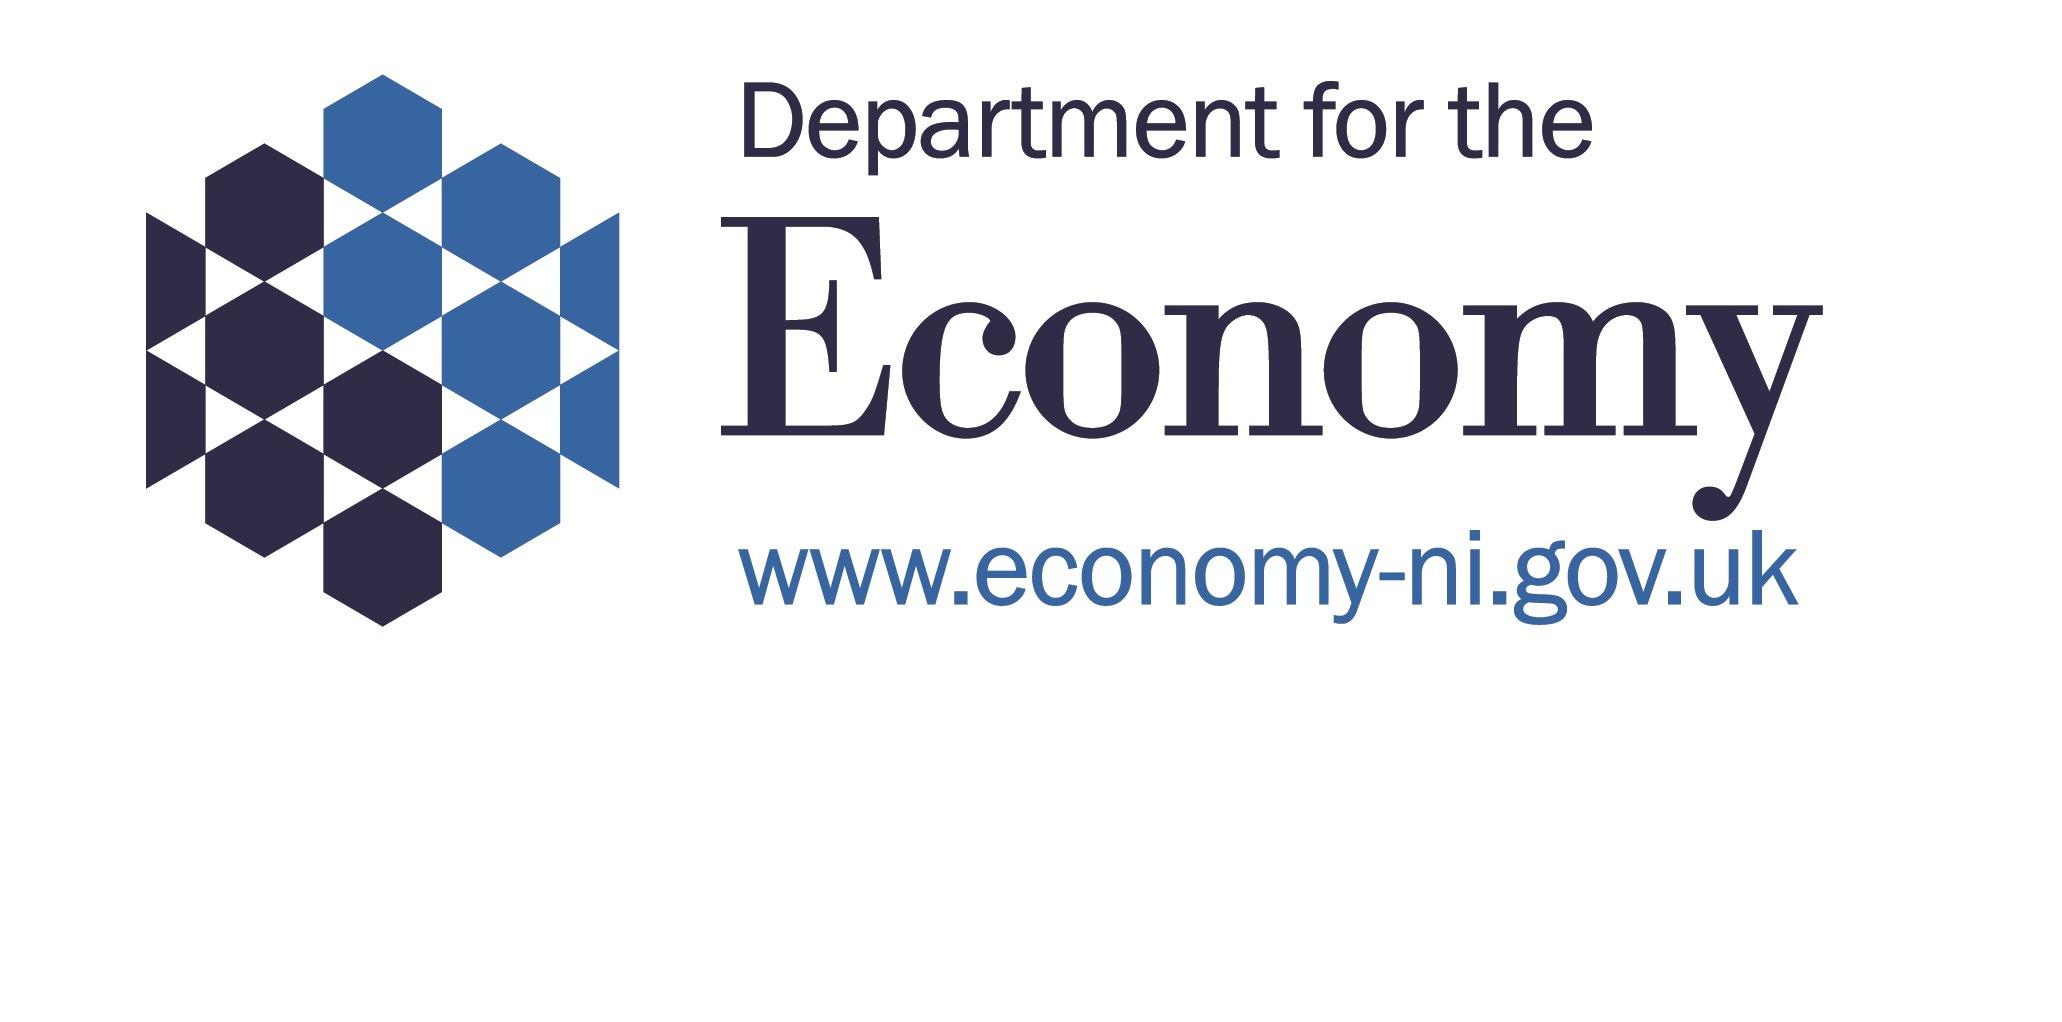 NI Department for Economy - NI Business news